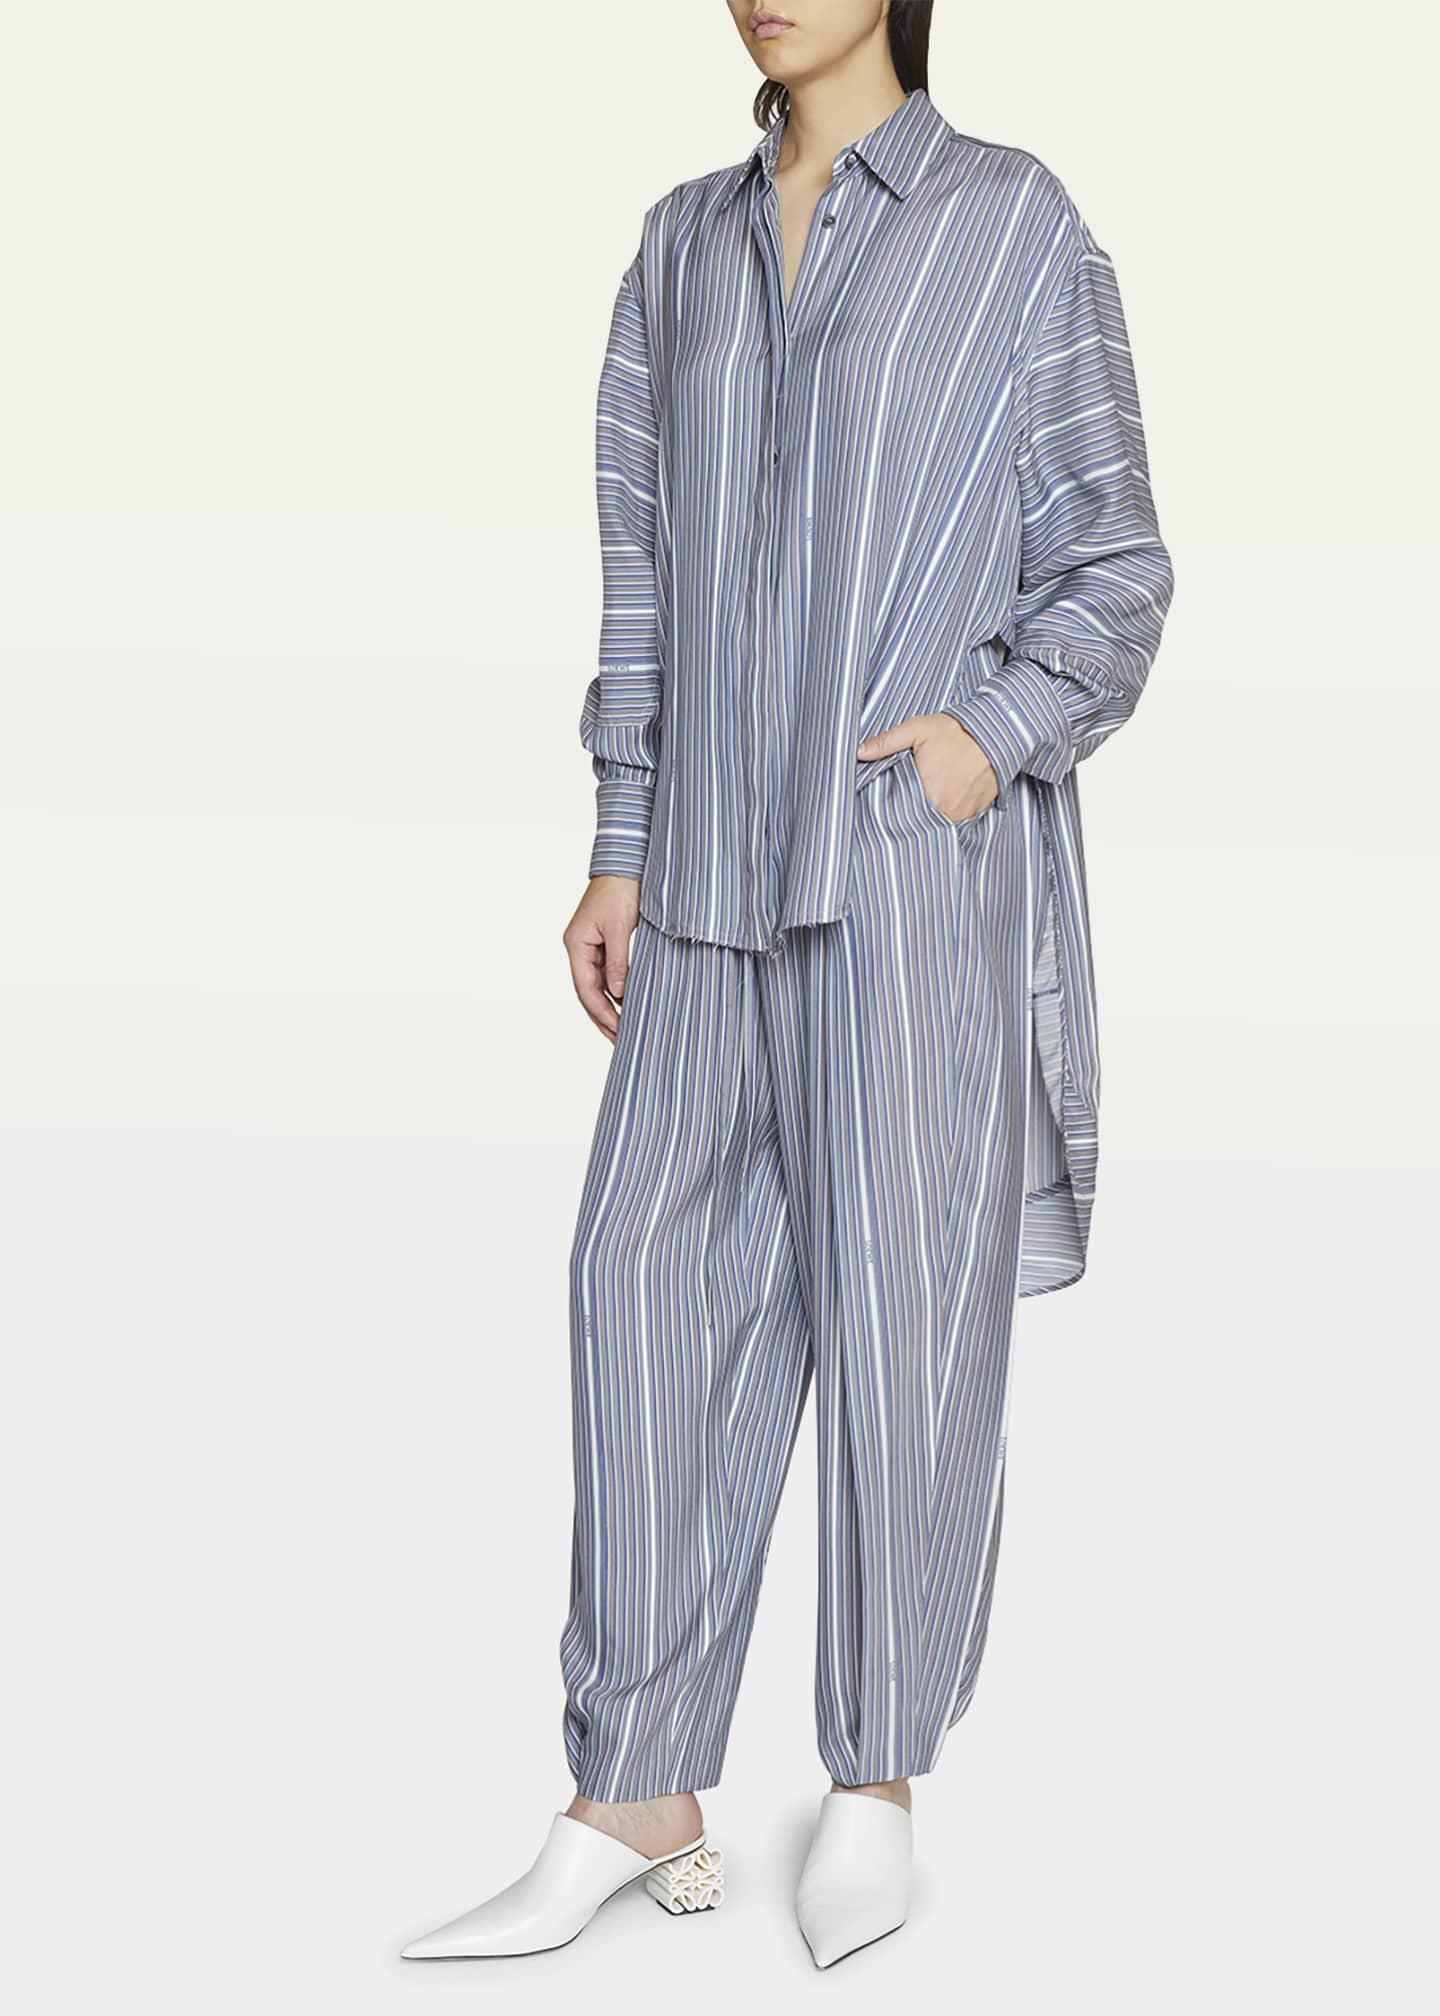 Brunello Cucinelli Men's Shearling-Lined Coat w/ Removable Hood